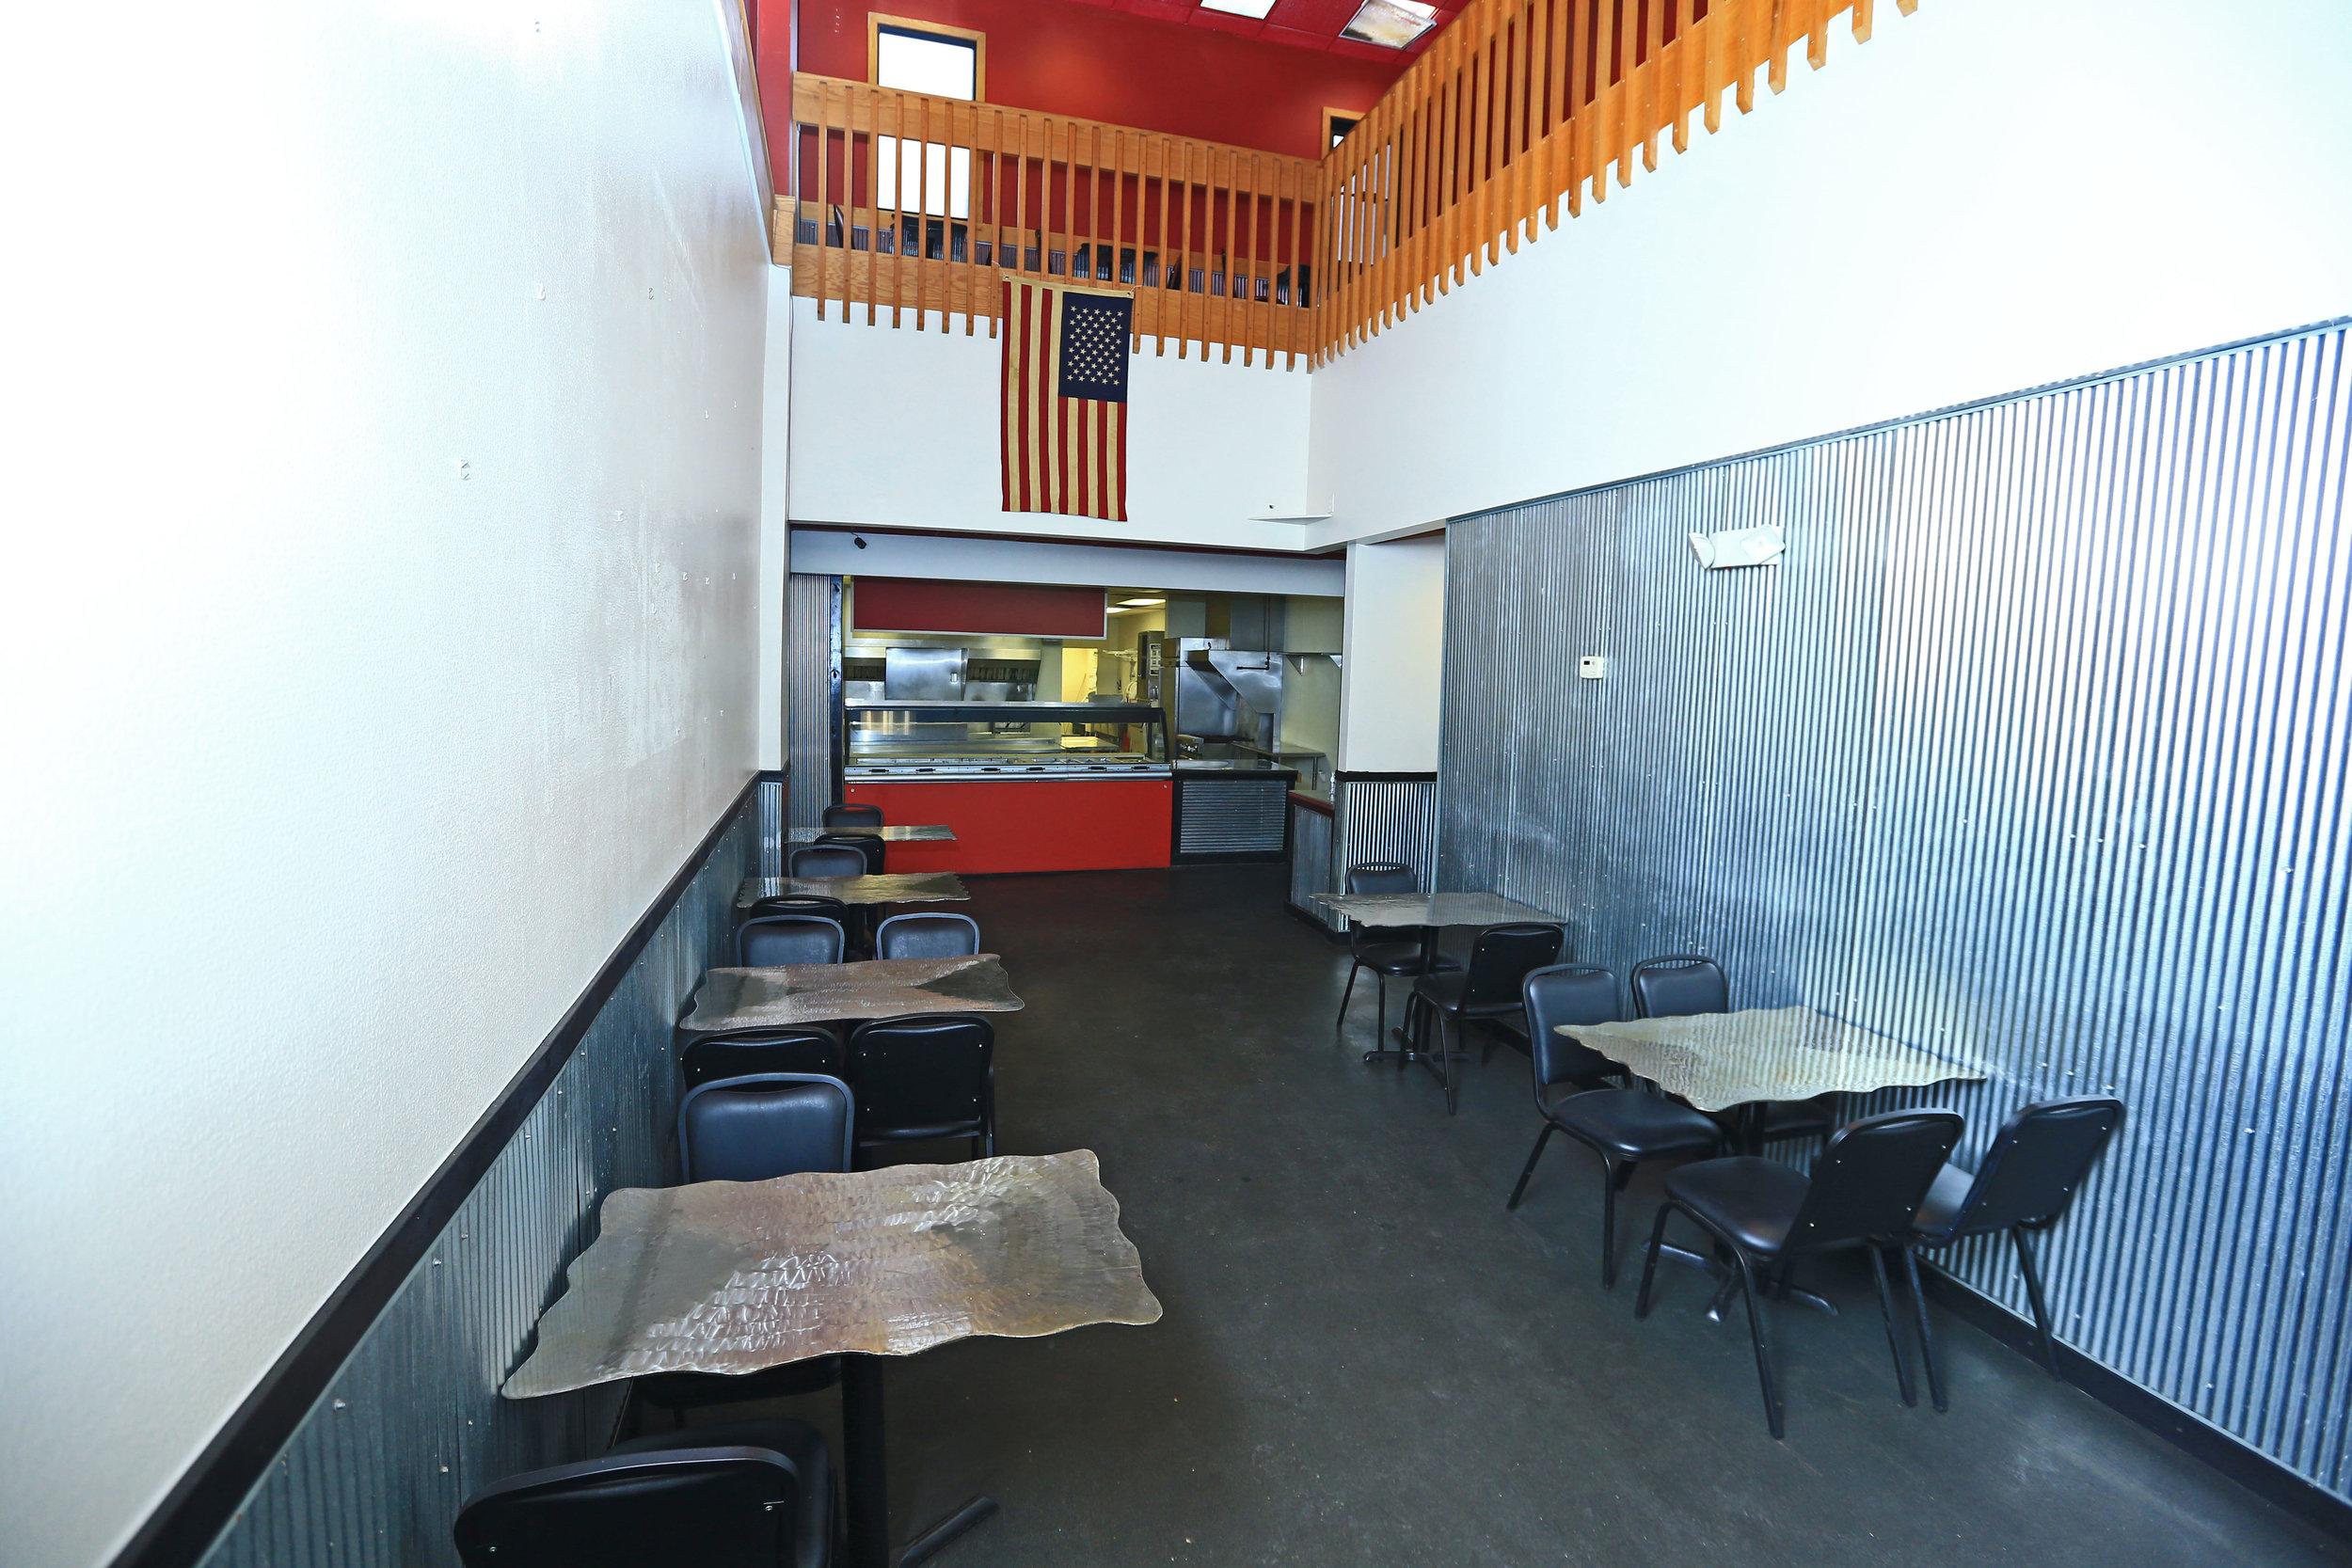 614 Adams St, Toledo, OH 43604, Pre-construction - Interior Dining Area, 2015